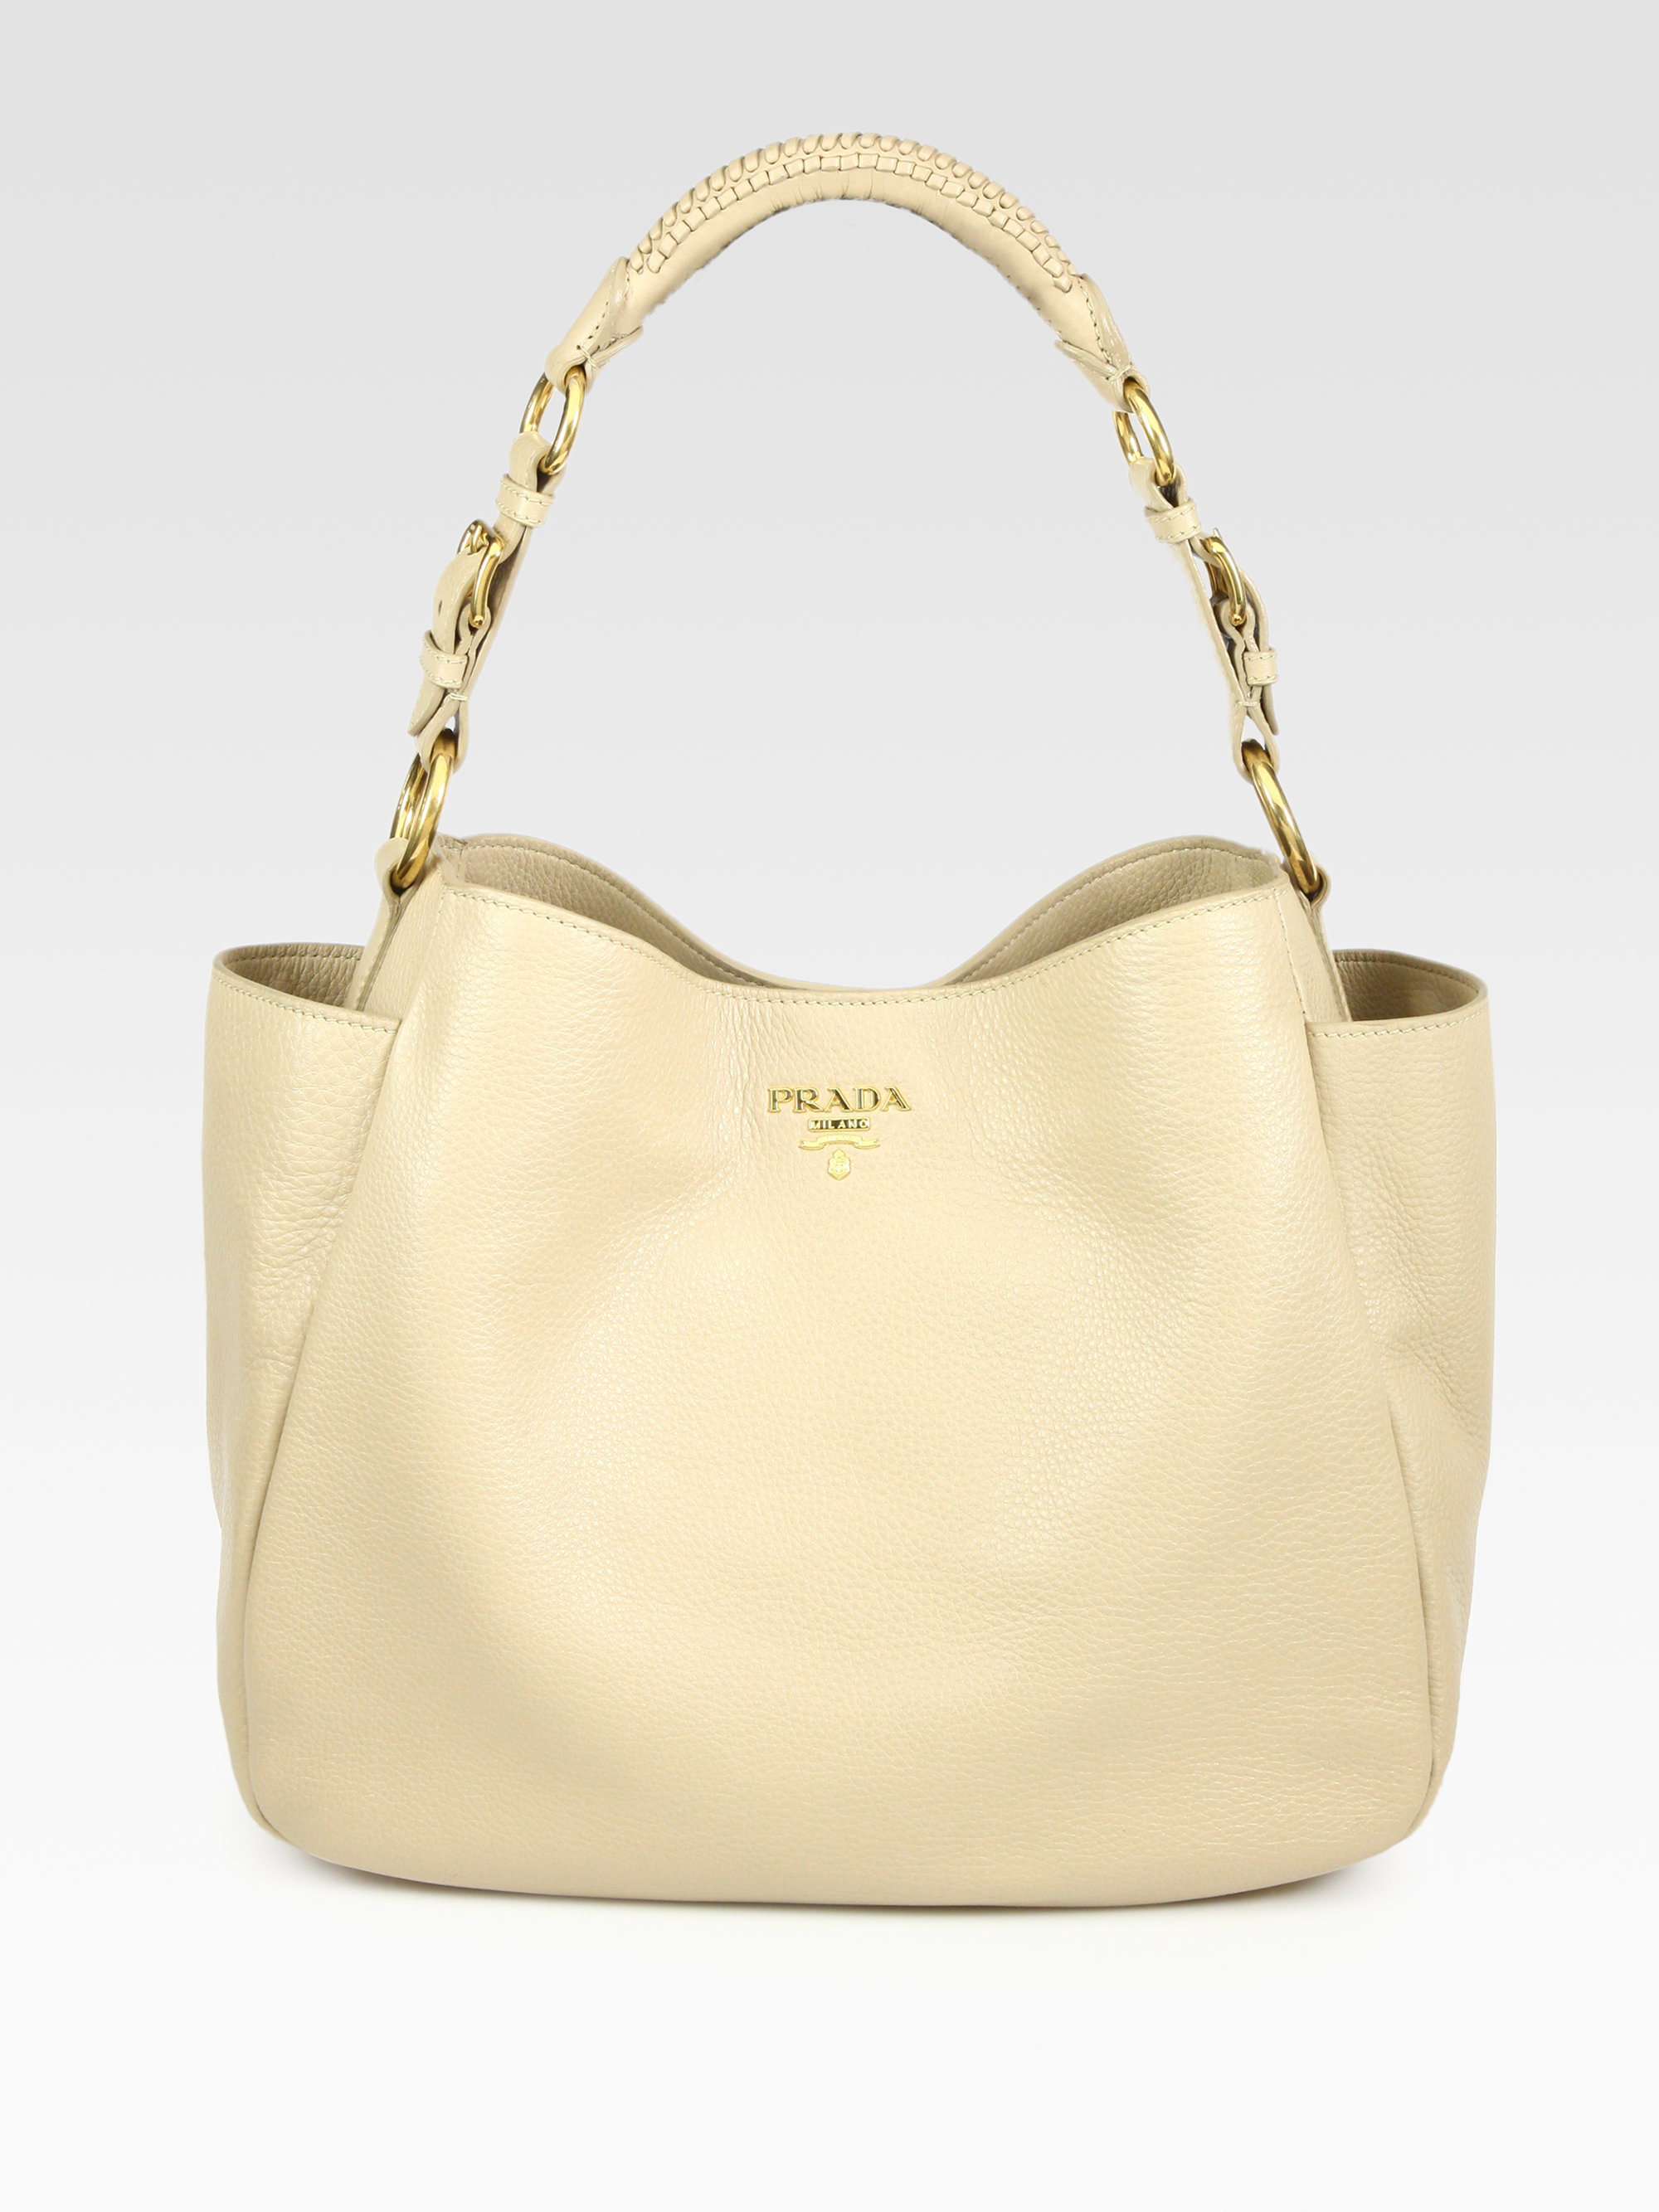 8e1b26b9d62b5 Lyst - Prada Vitello Daino Hobo Bag in Natural